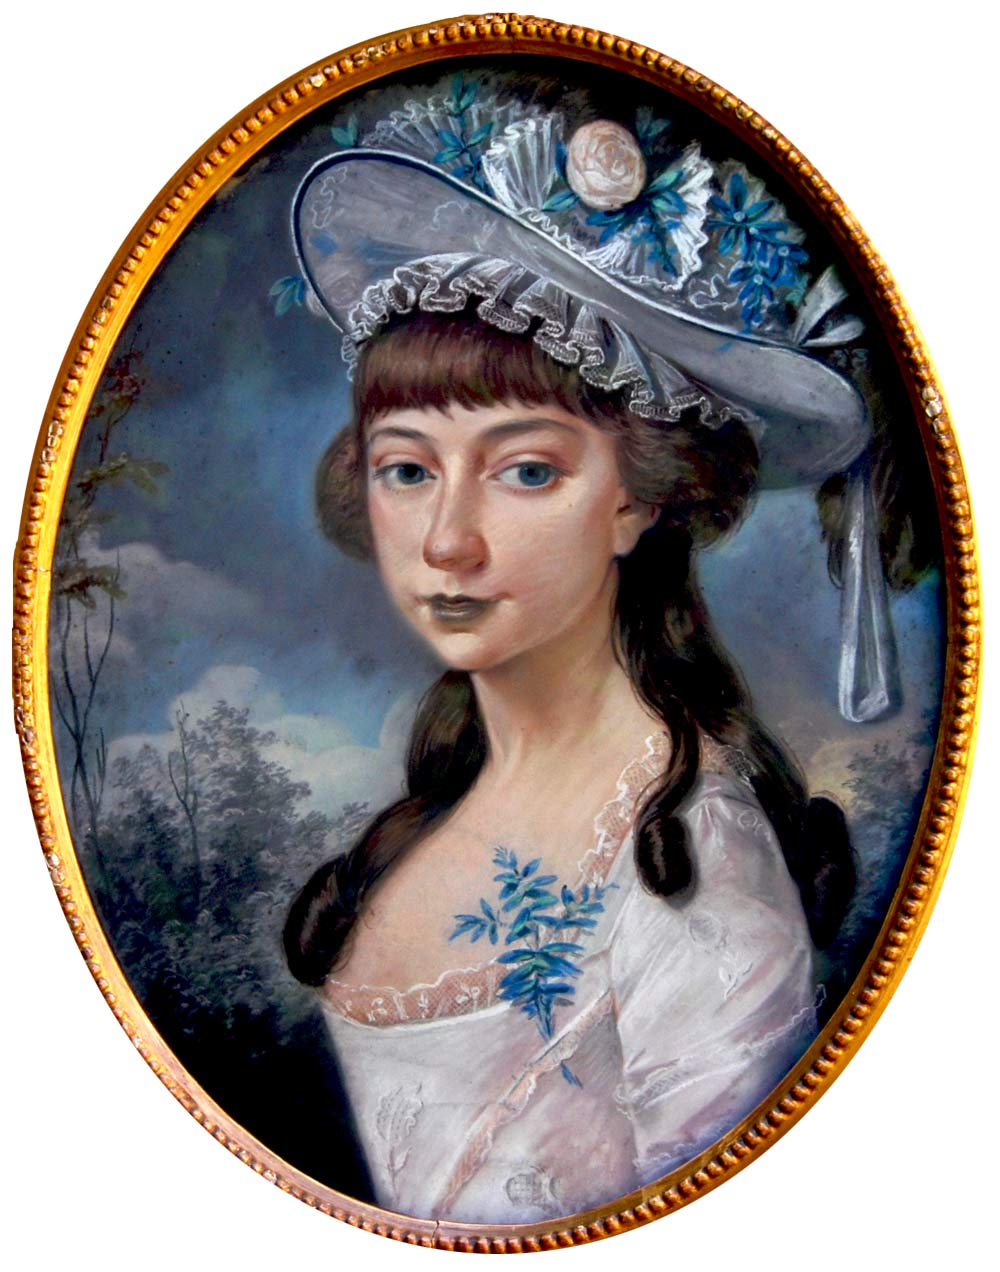 Mary-Ann-Hardy-in-1785-by-Huquier